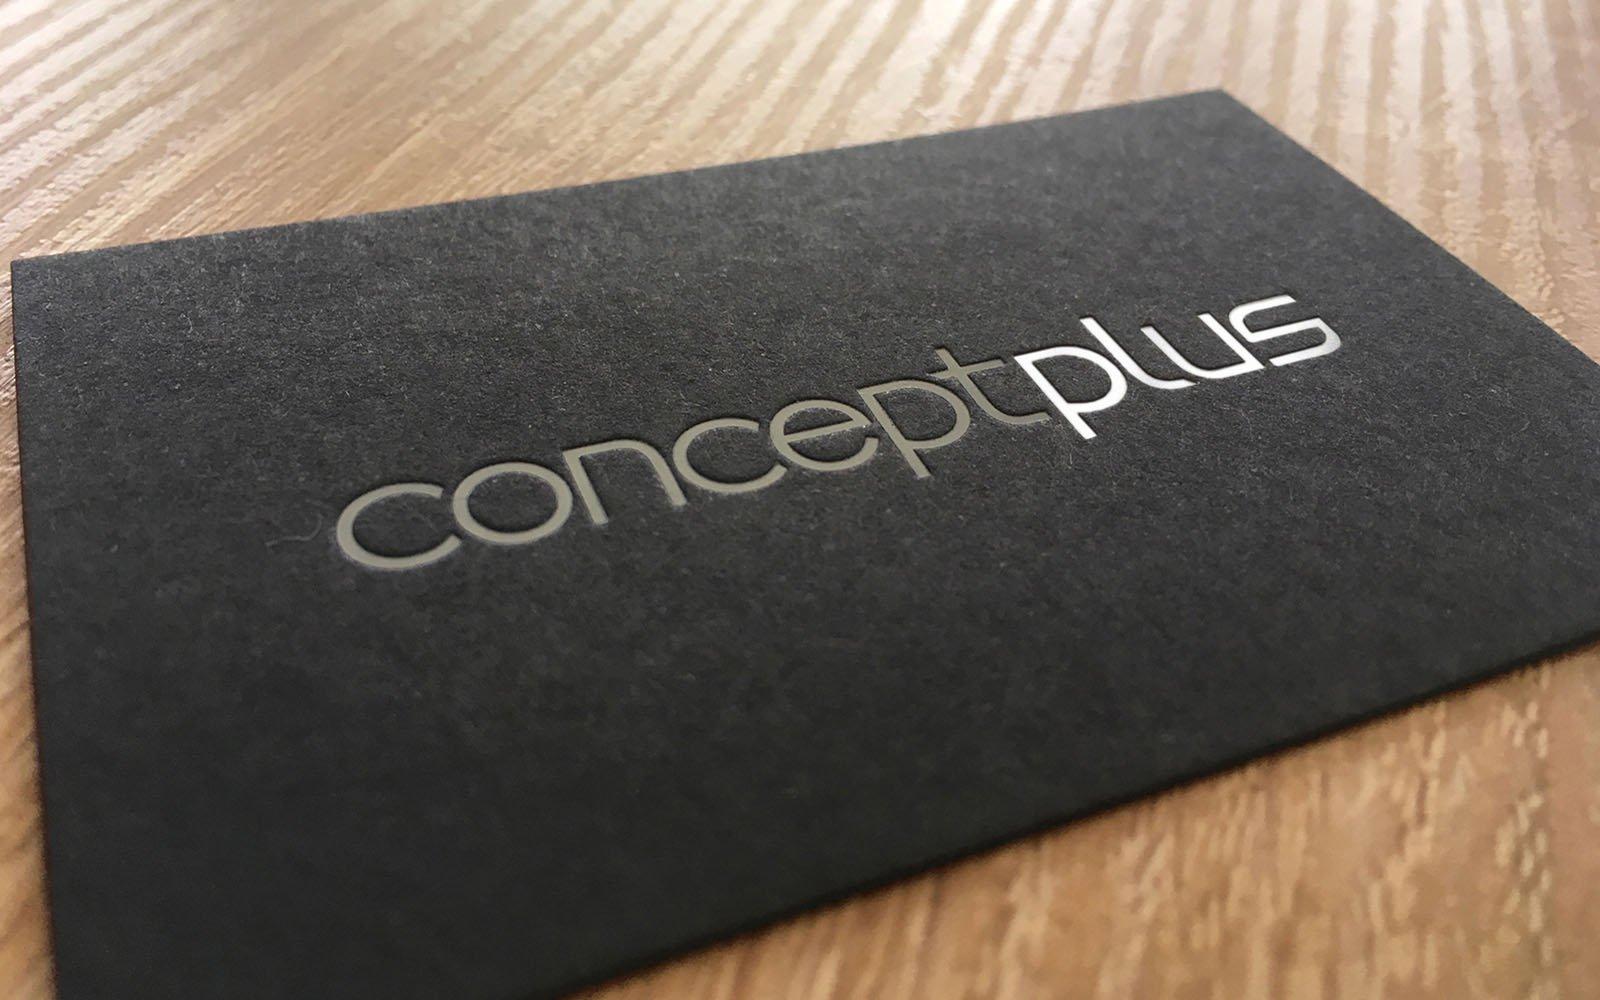 Marke conceptplus